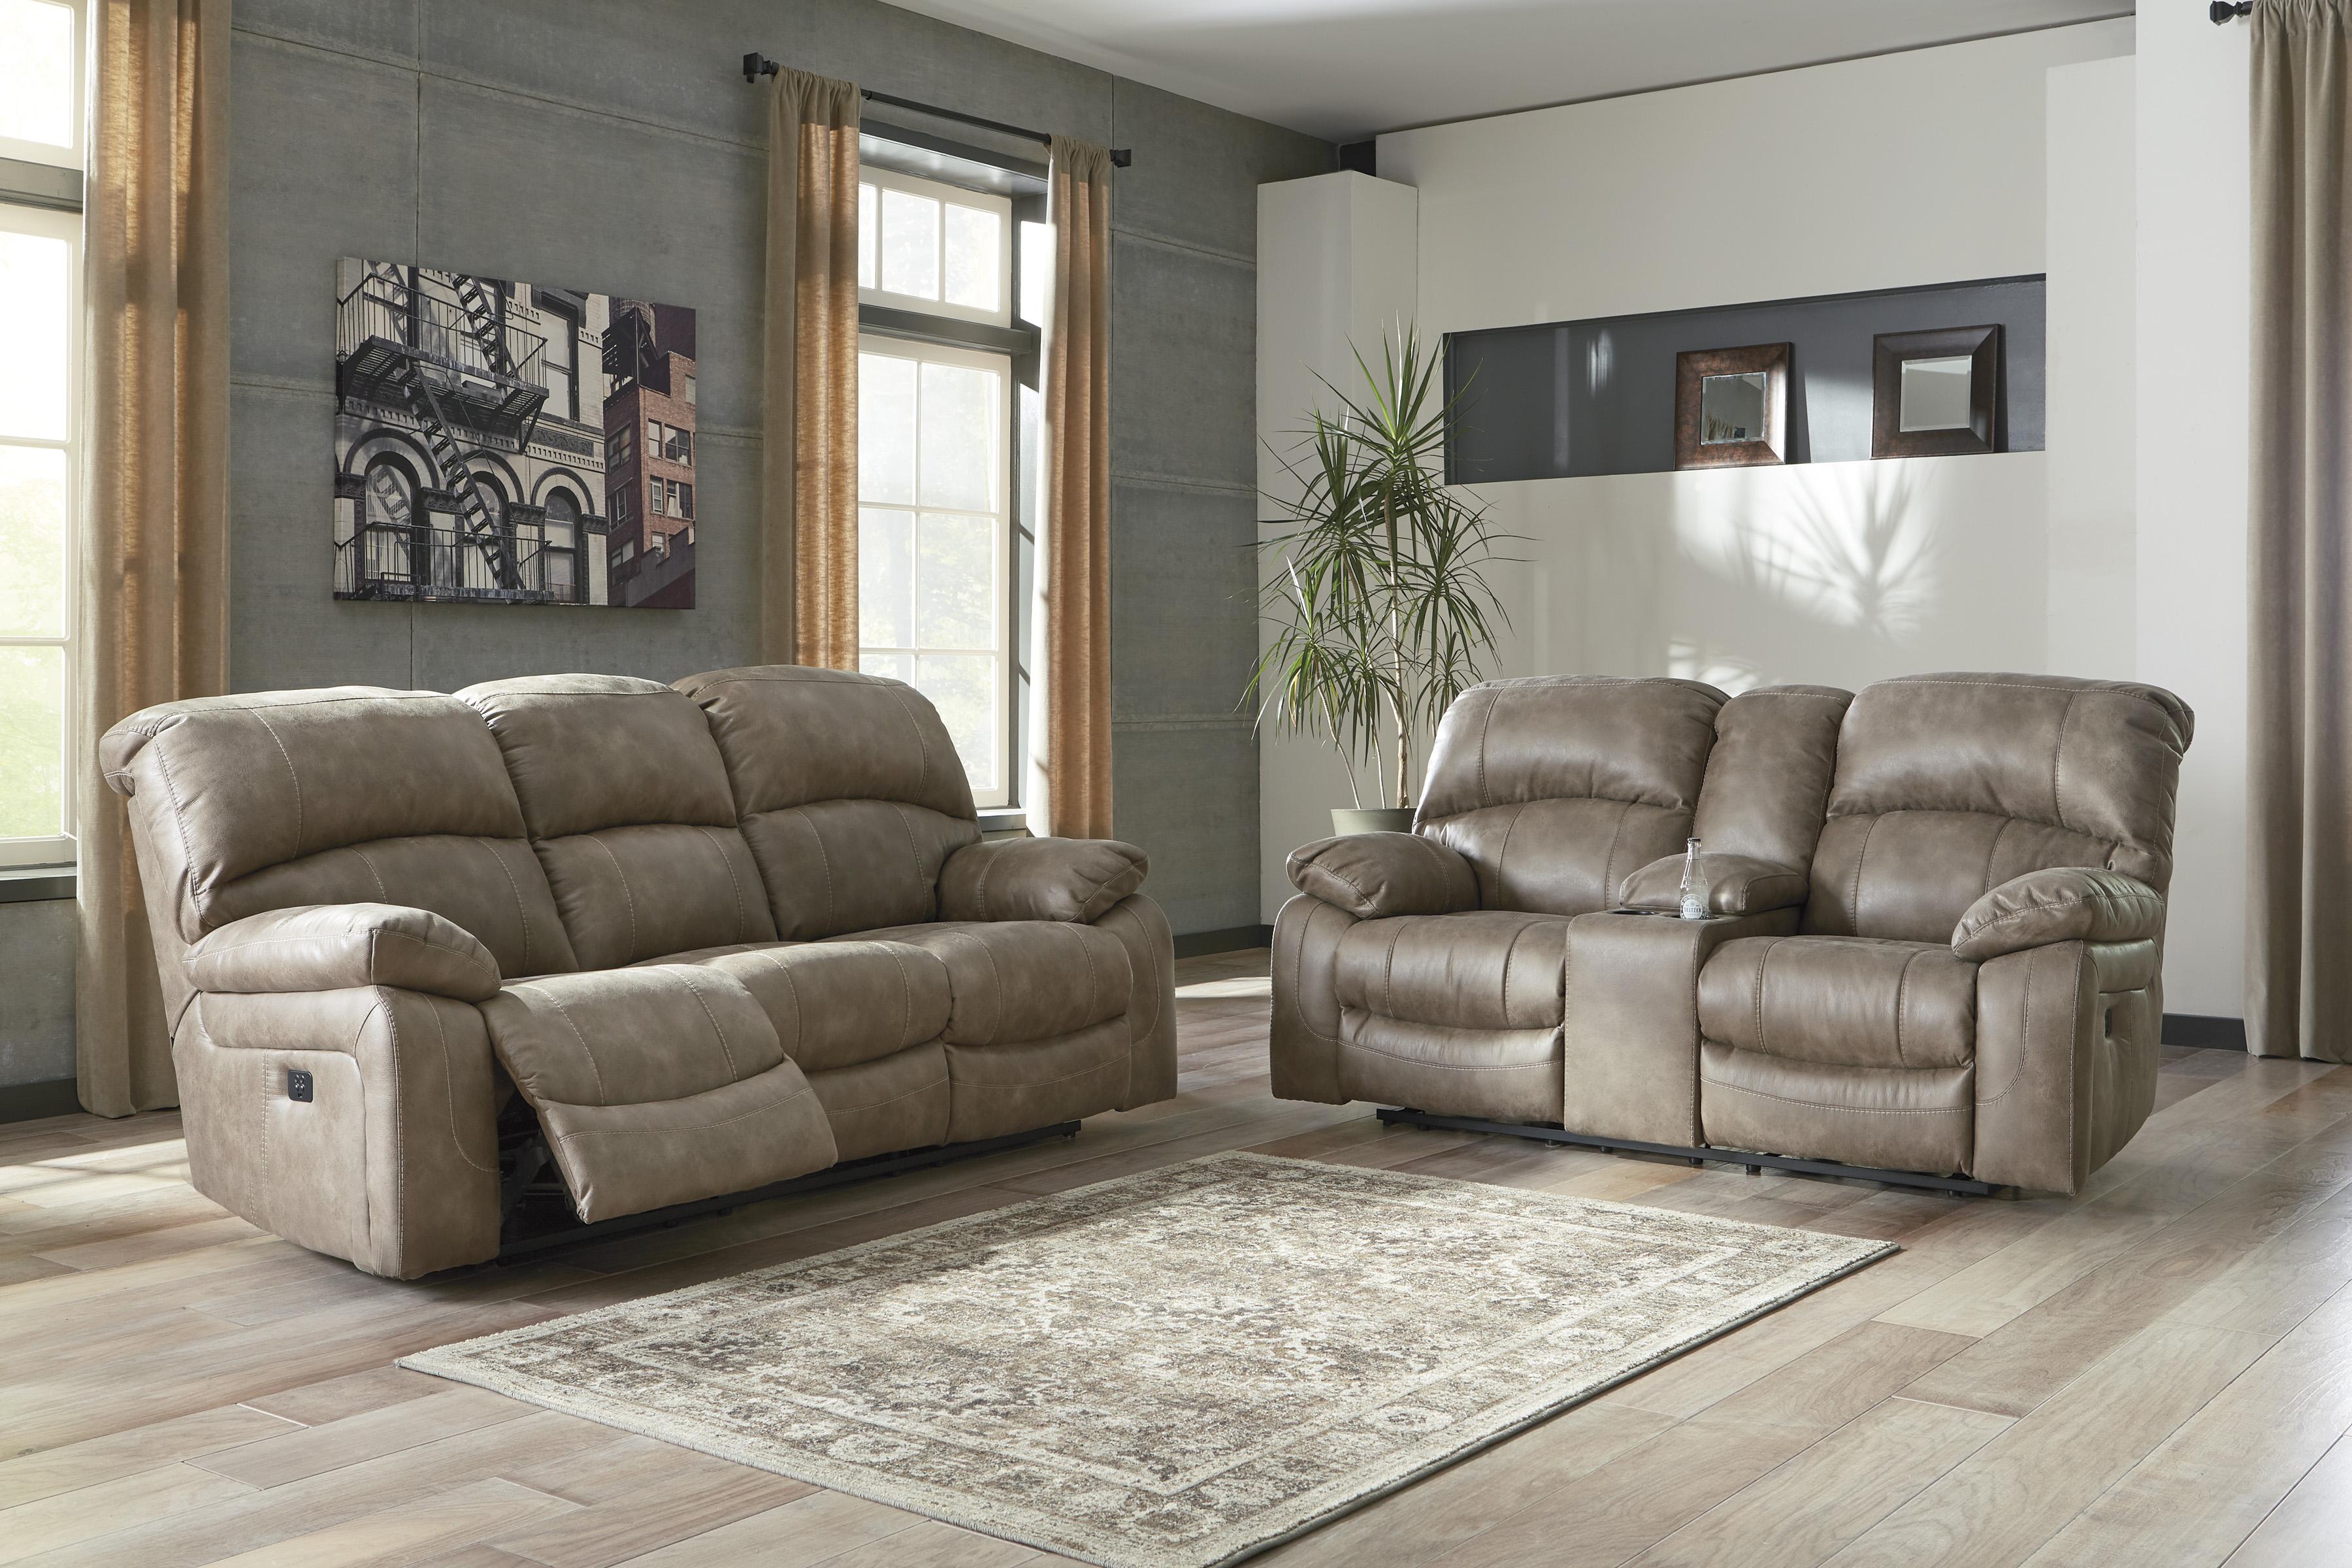 Dunwell Driftwood Power Reclining All American Furniture